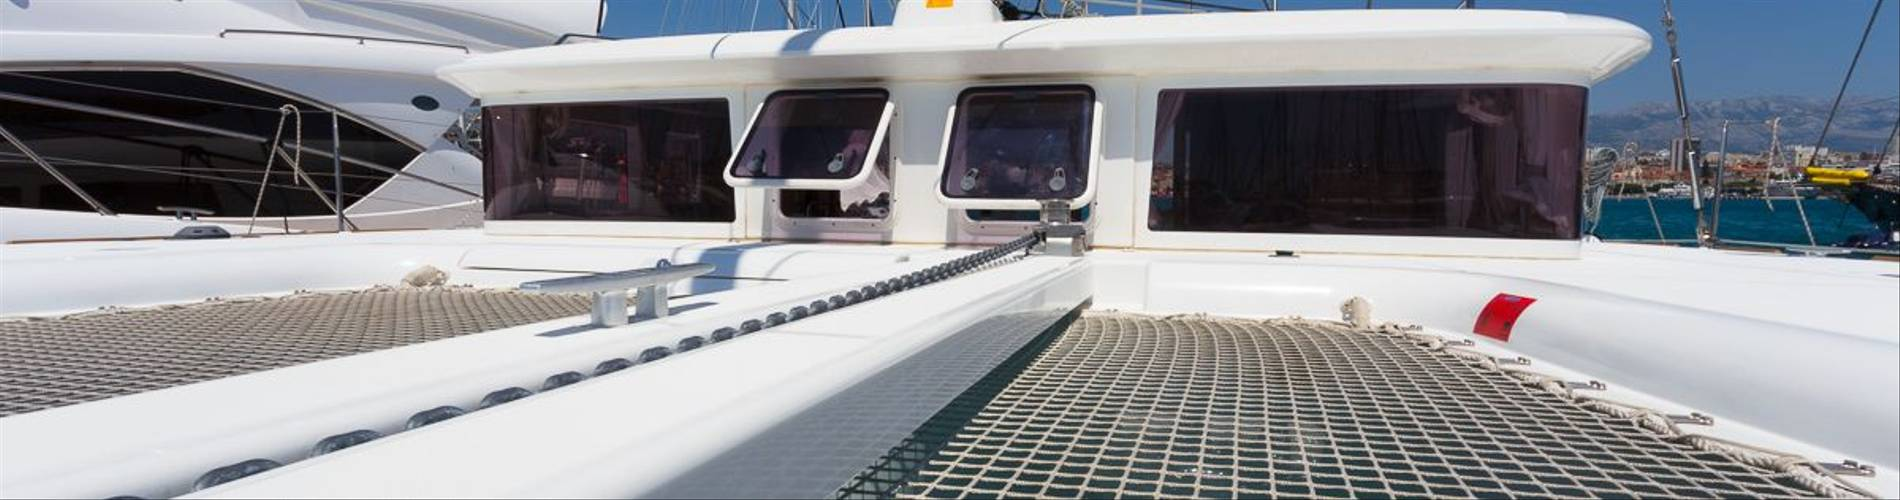 catamaran cruise 21.jpg